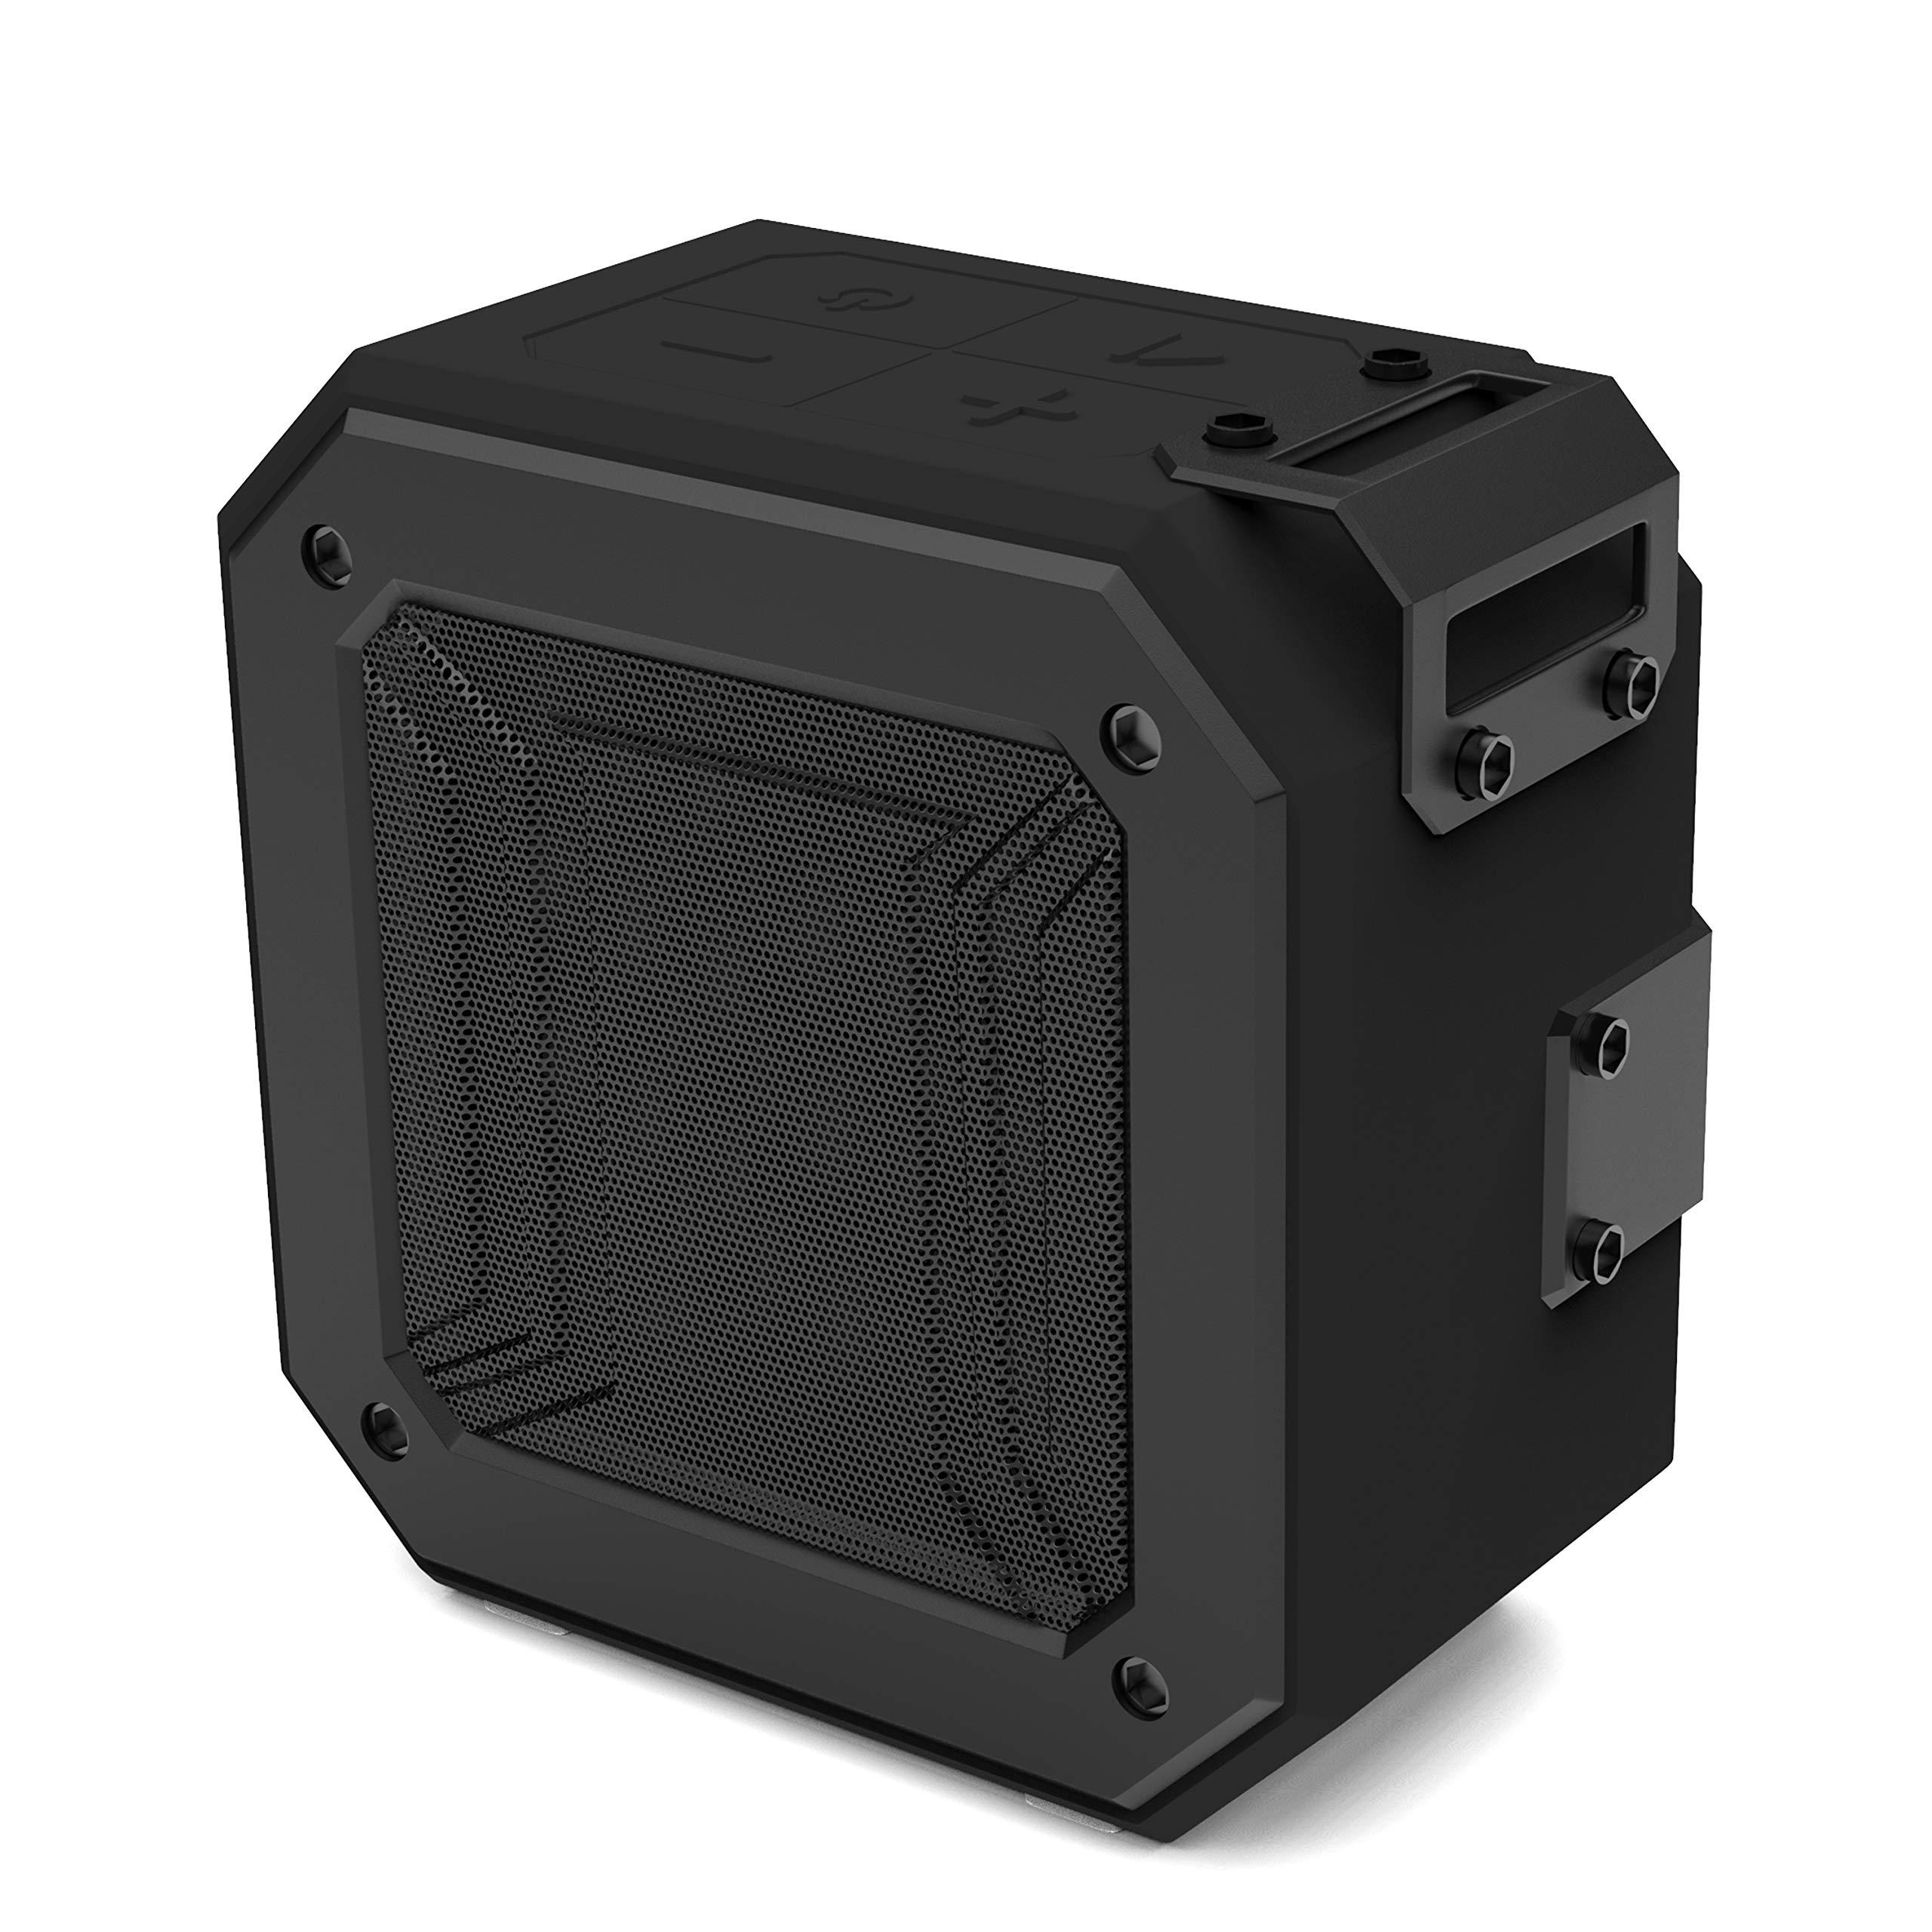 Staunch Thunder 600 6-Watt Bluetooth 5.0 Wireless Speaker with IPX6 Waterproof, TWS Function Support and HD Sound (Black)